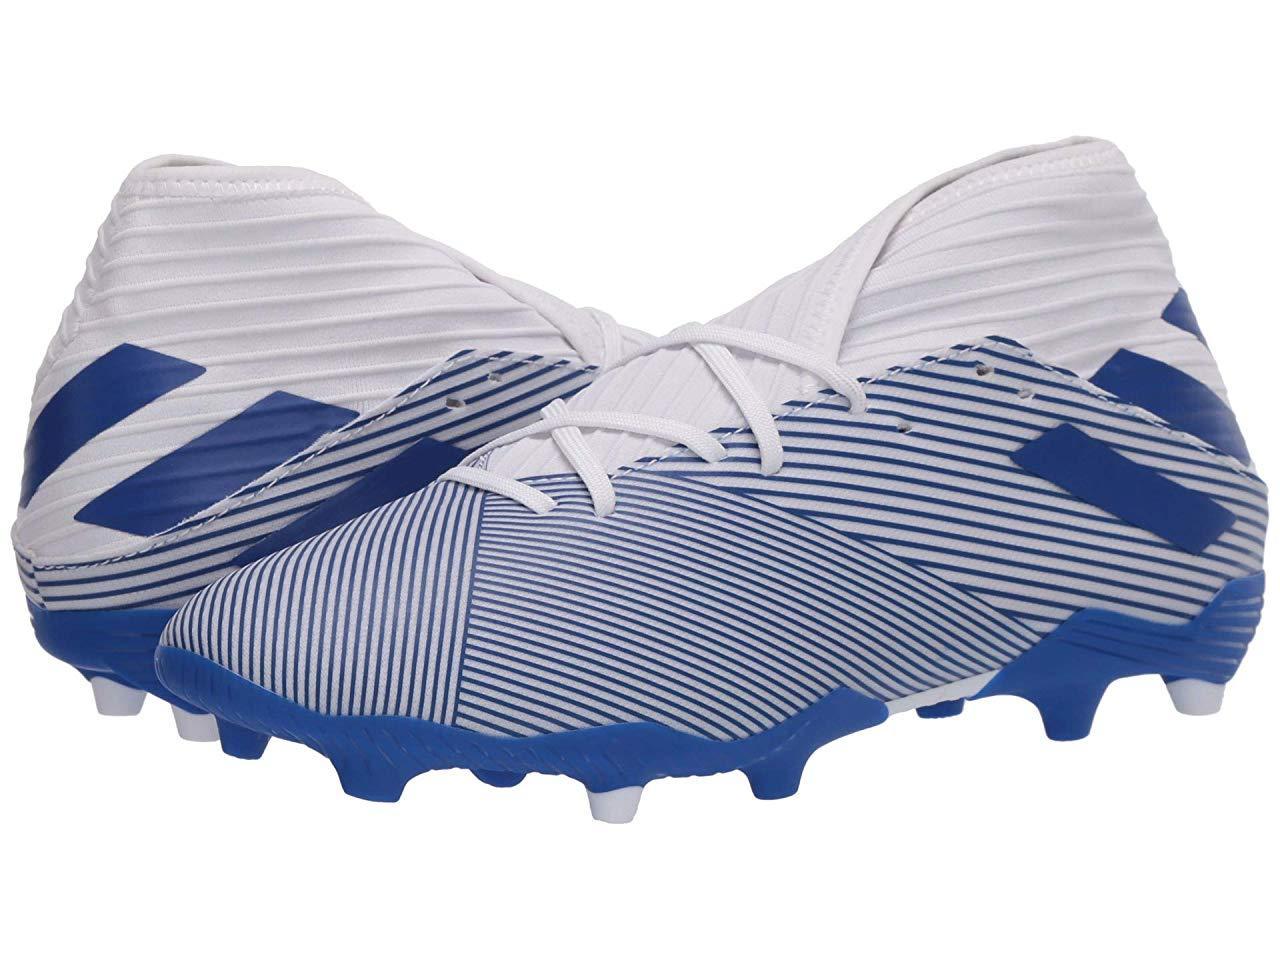 Кроссовки/Кеды adidas Nemeziz 19.3 FG Footwear White/Team Royal Blue/Team Royal Blue